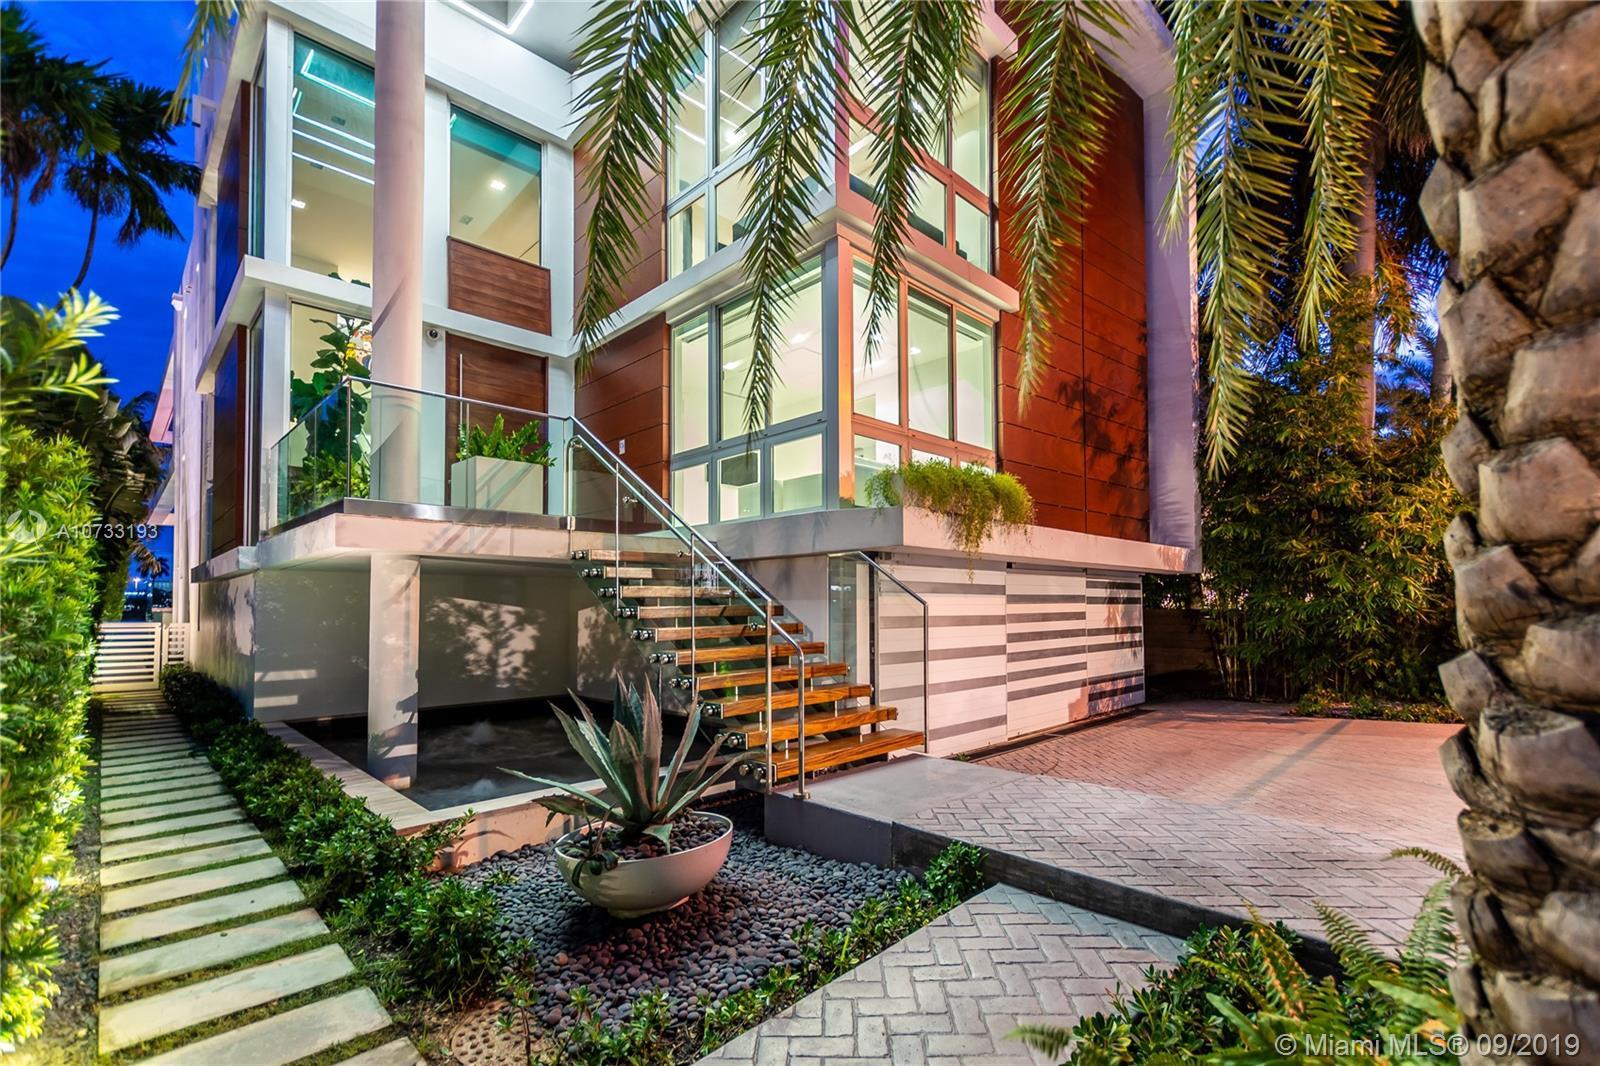 280 S Coconut Ln Luxury Real Estate